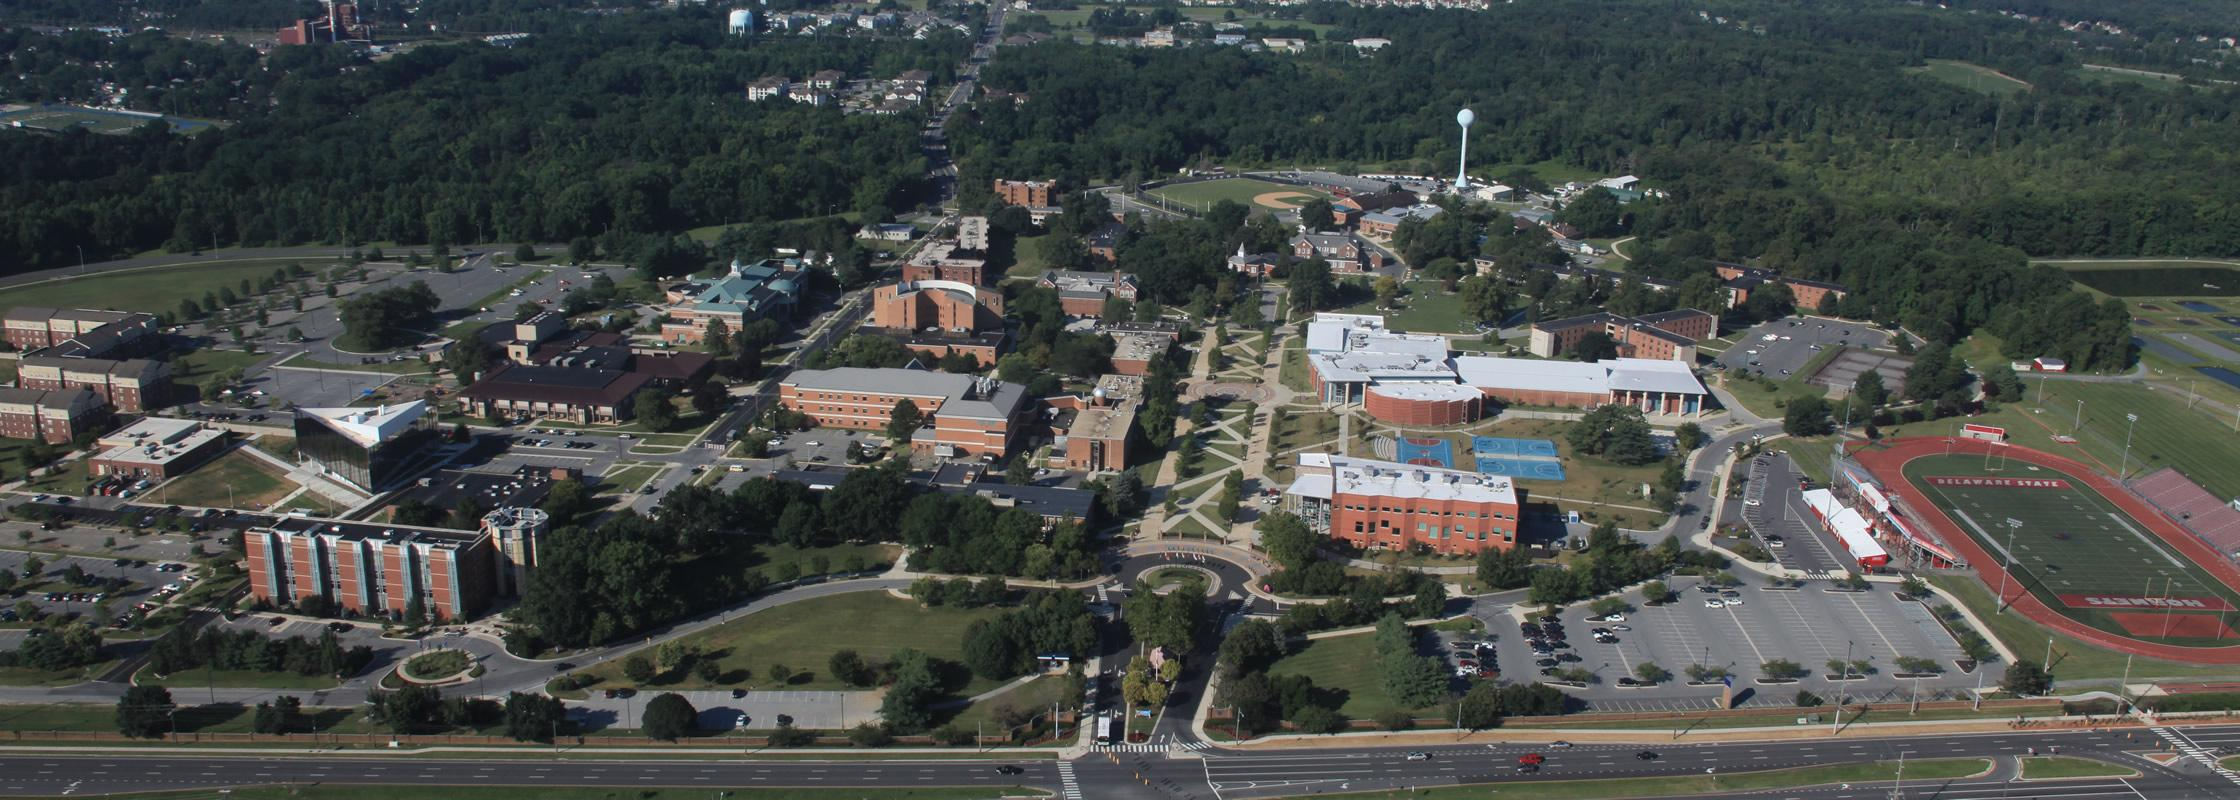 aerial view of DSU campus